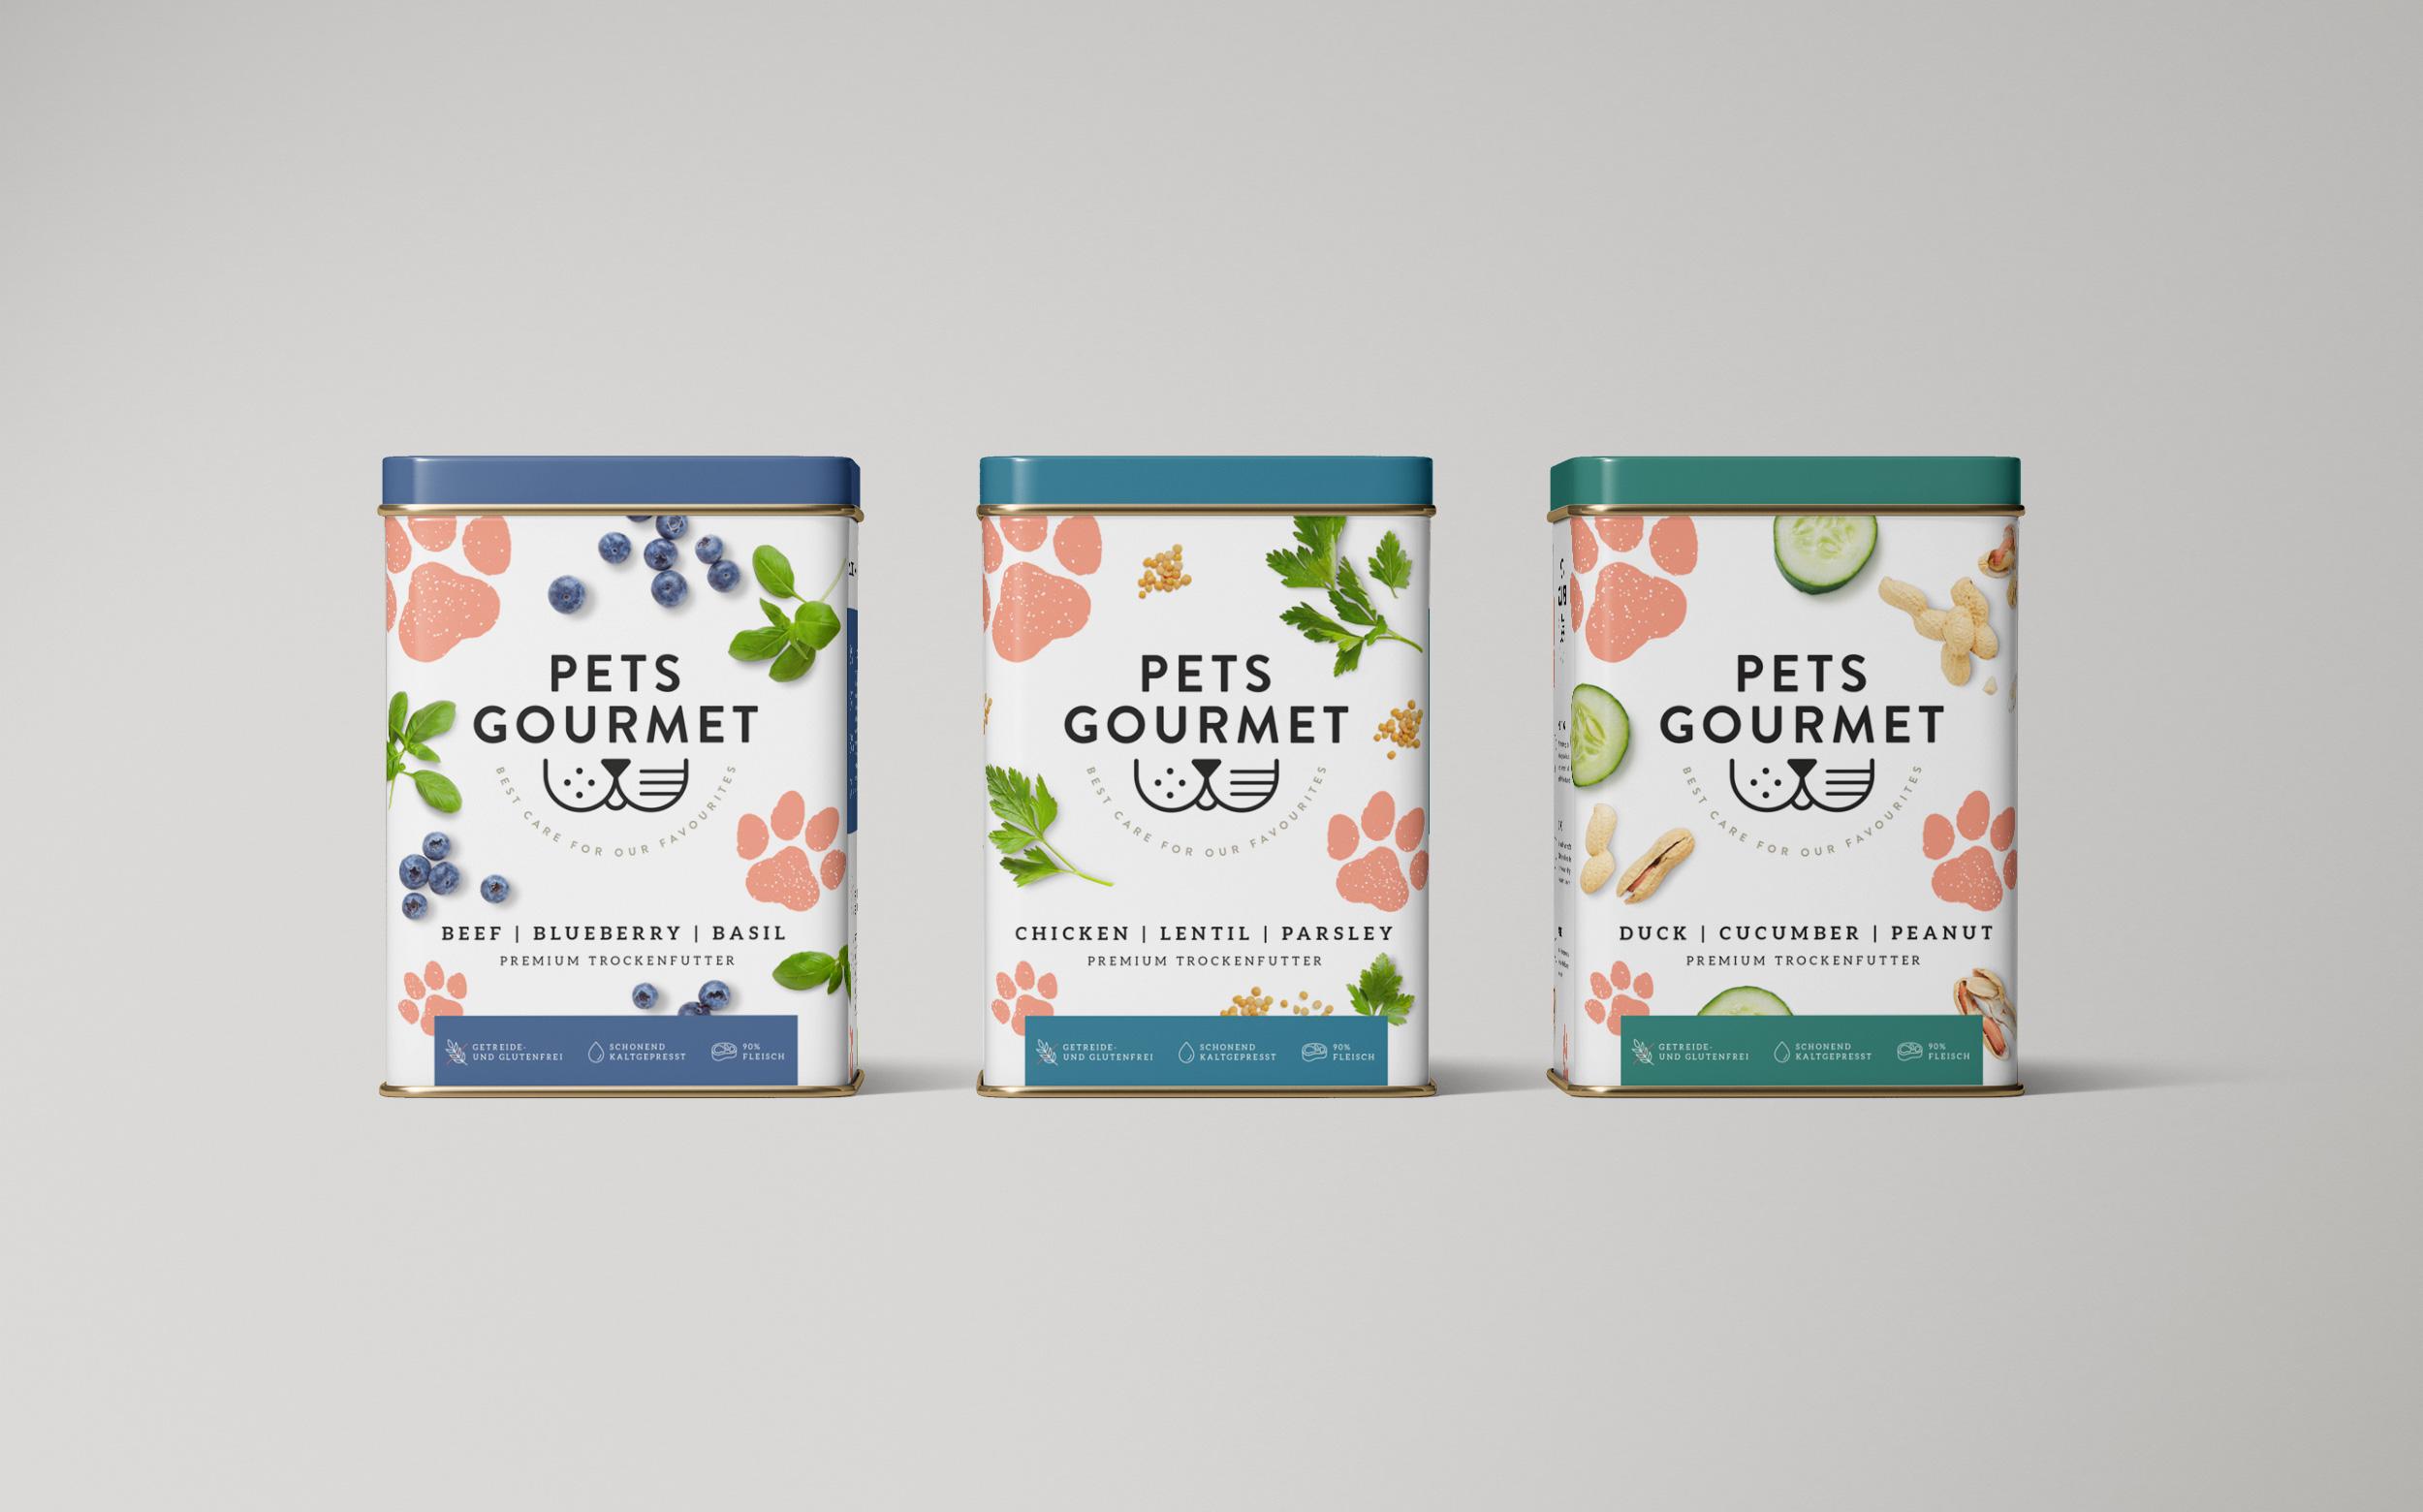 Pets_Gourmet_02